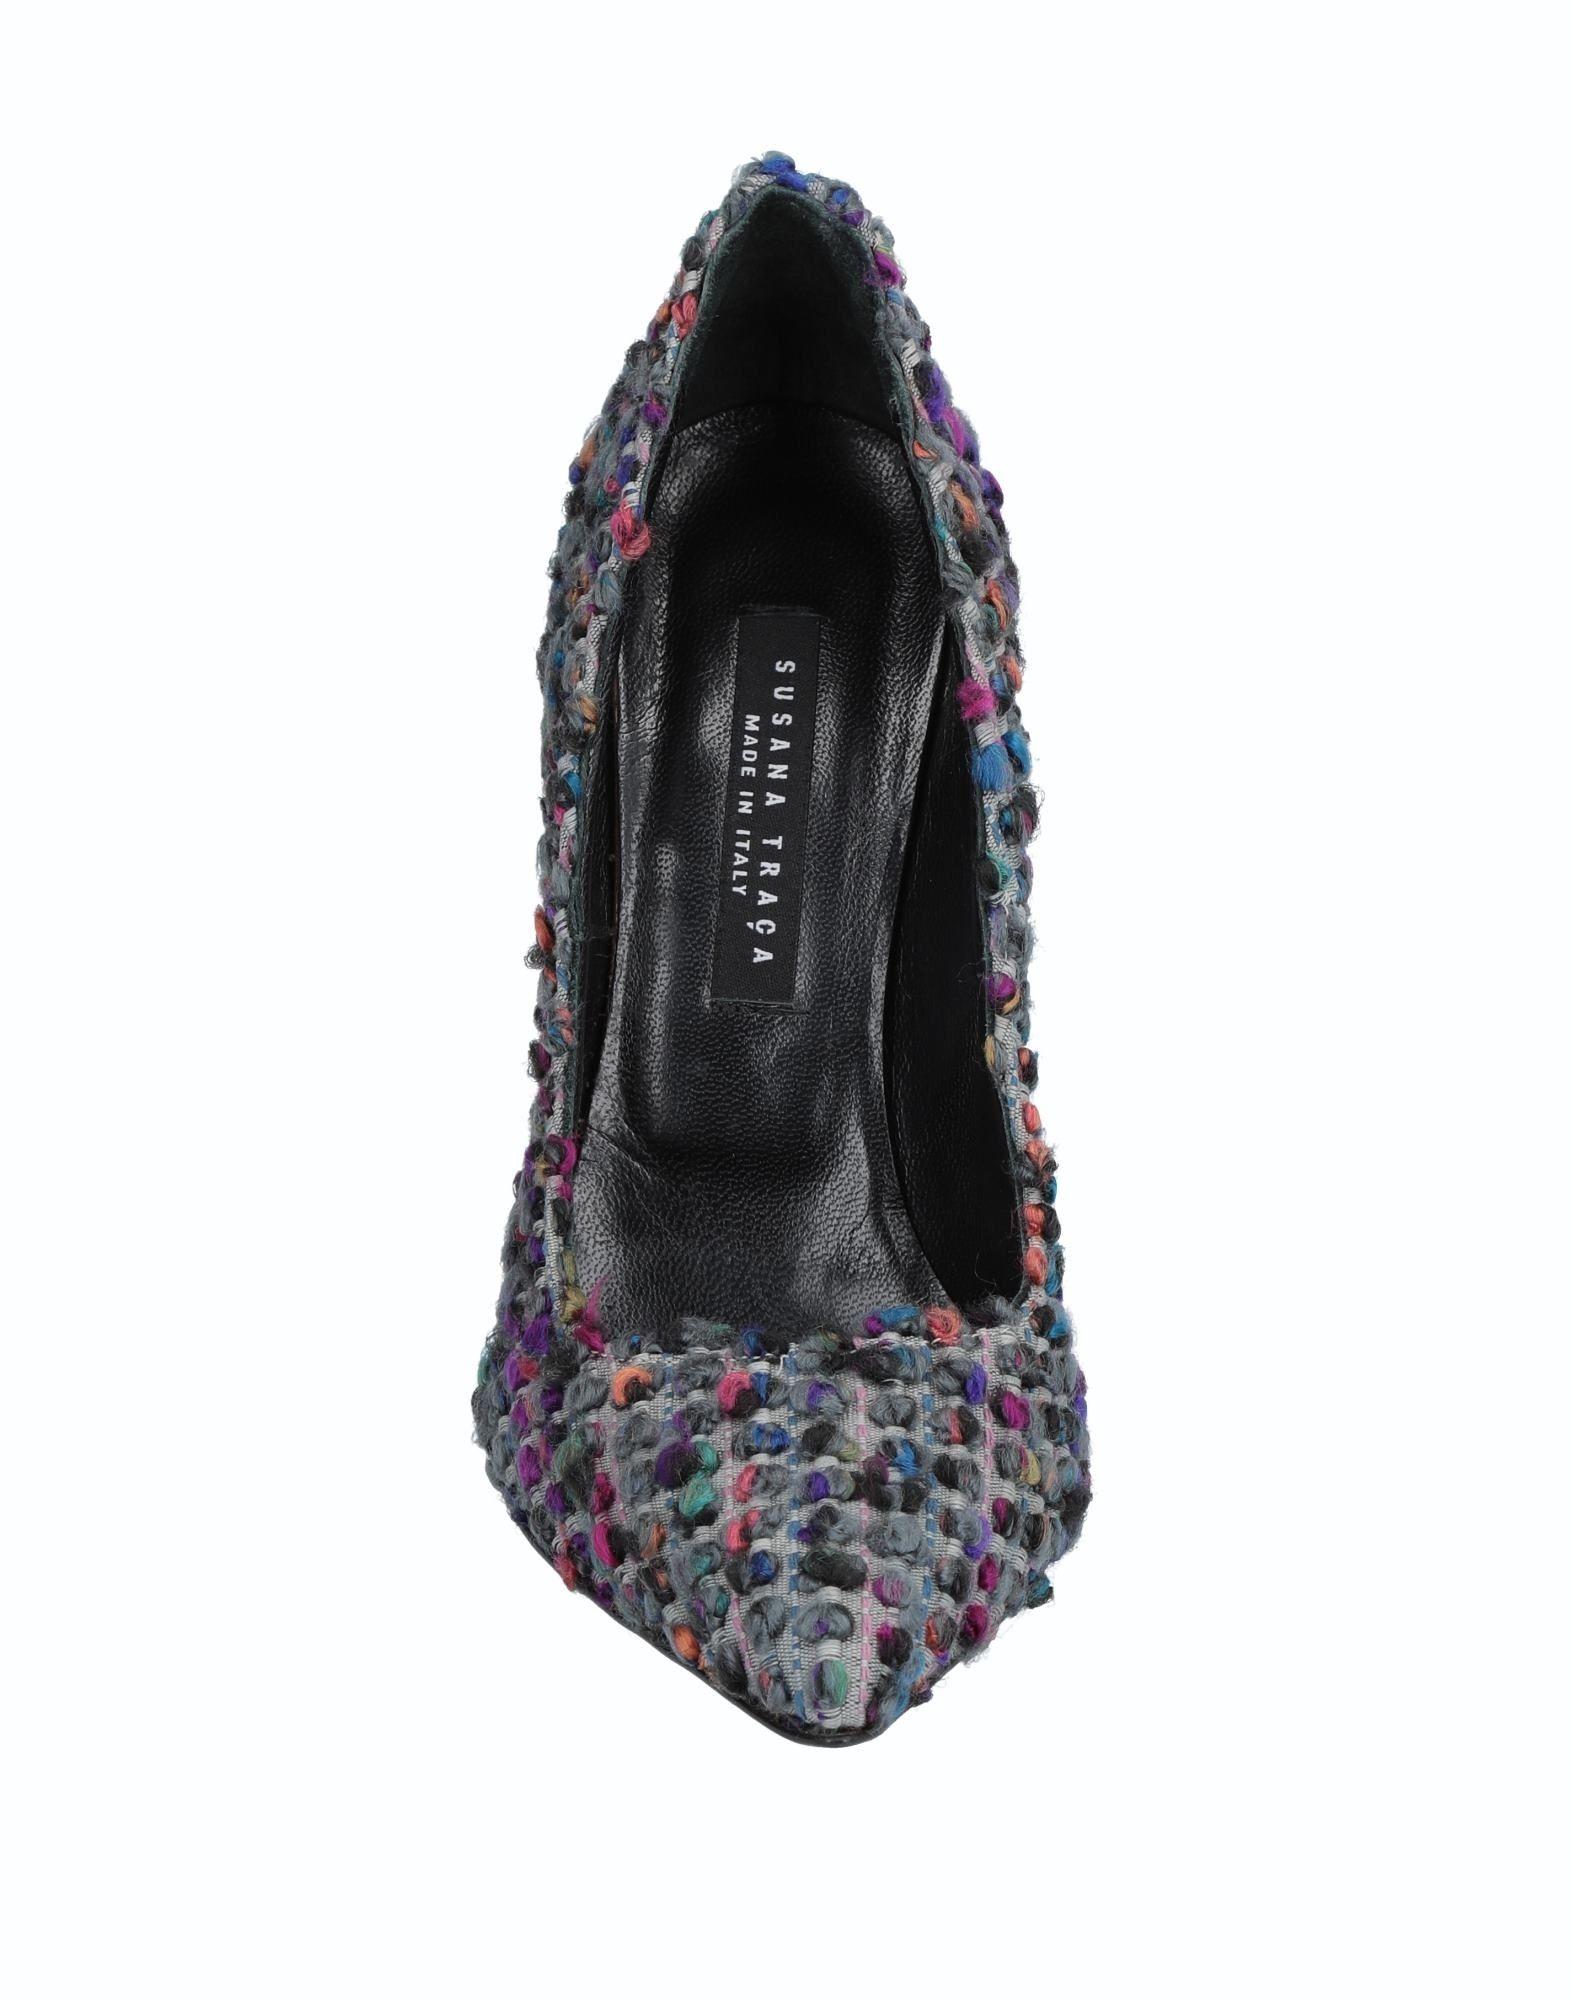 Susana Traca Schuhe Pumps Damen  11537109HT Neue Schuhe Traca 3161eb